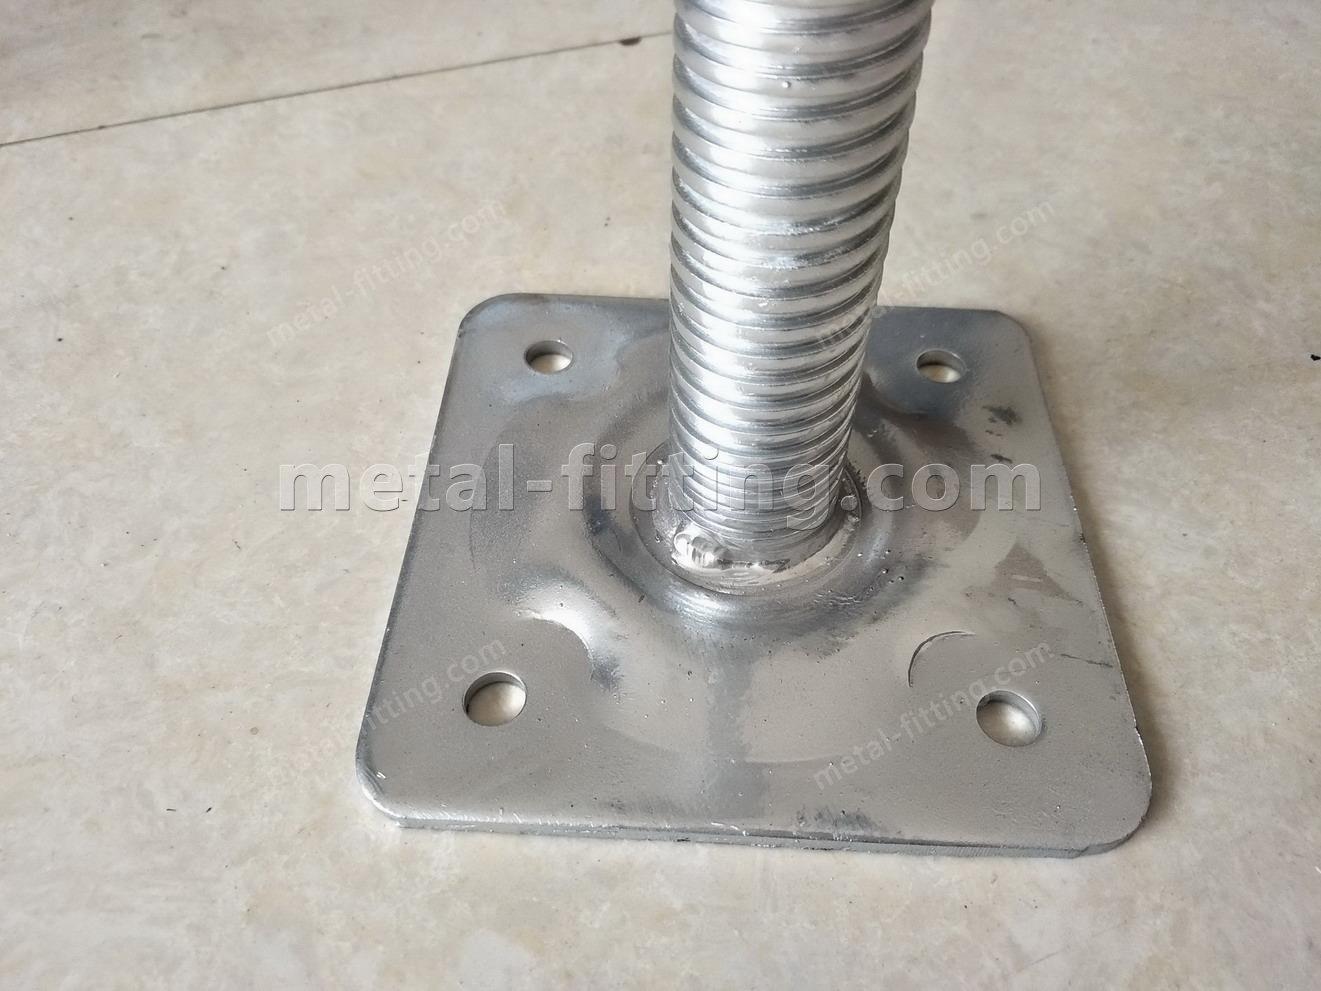 scaffolding standards jack base,scaffolding,scaffold part-scaffold JACK BASE (1)